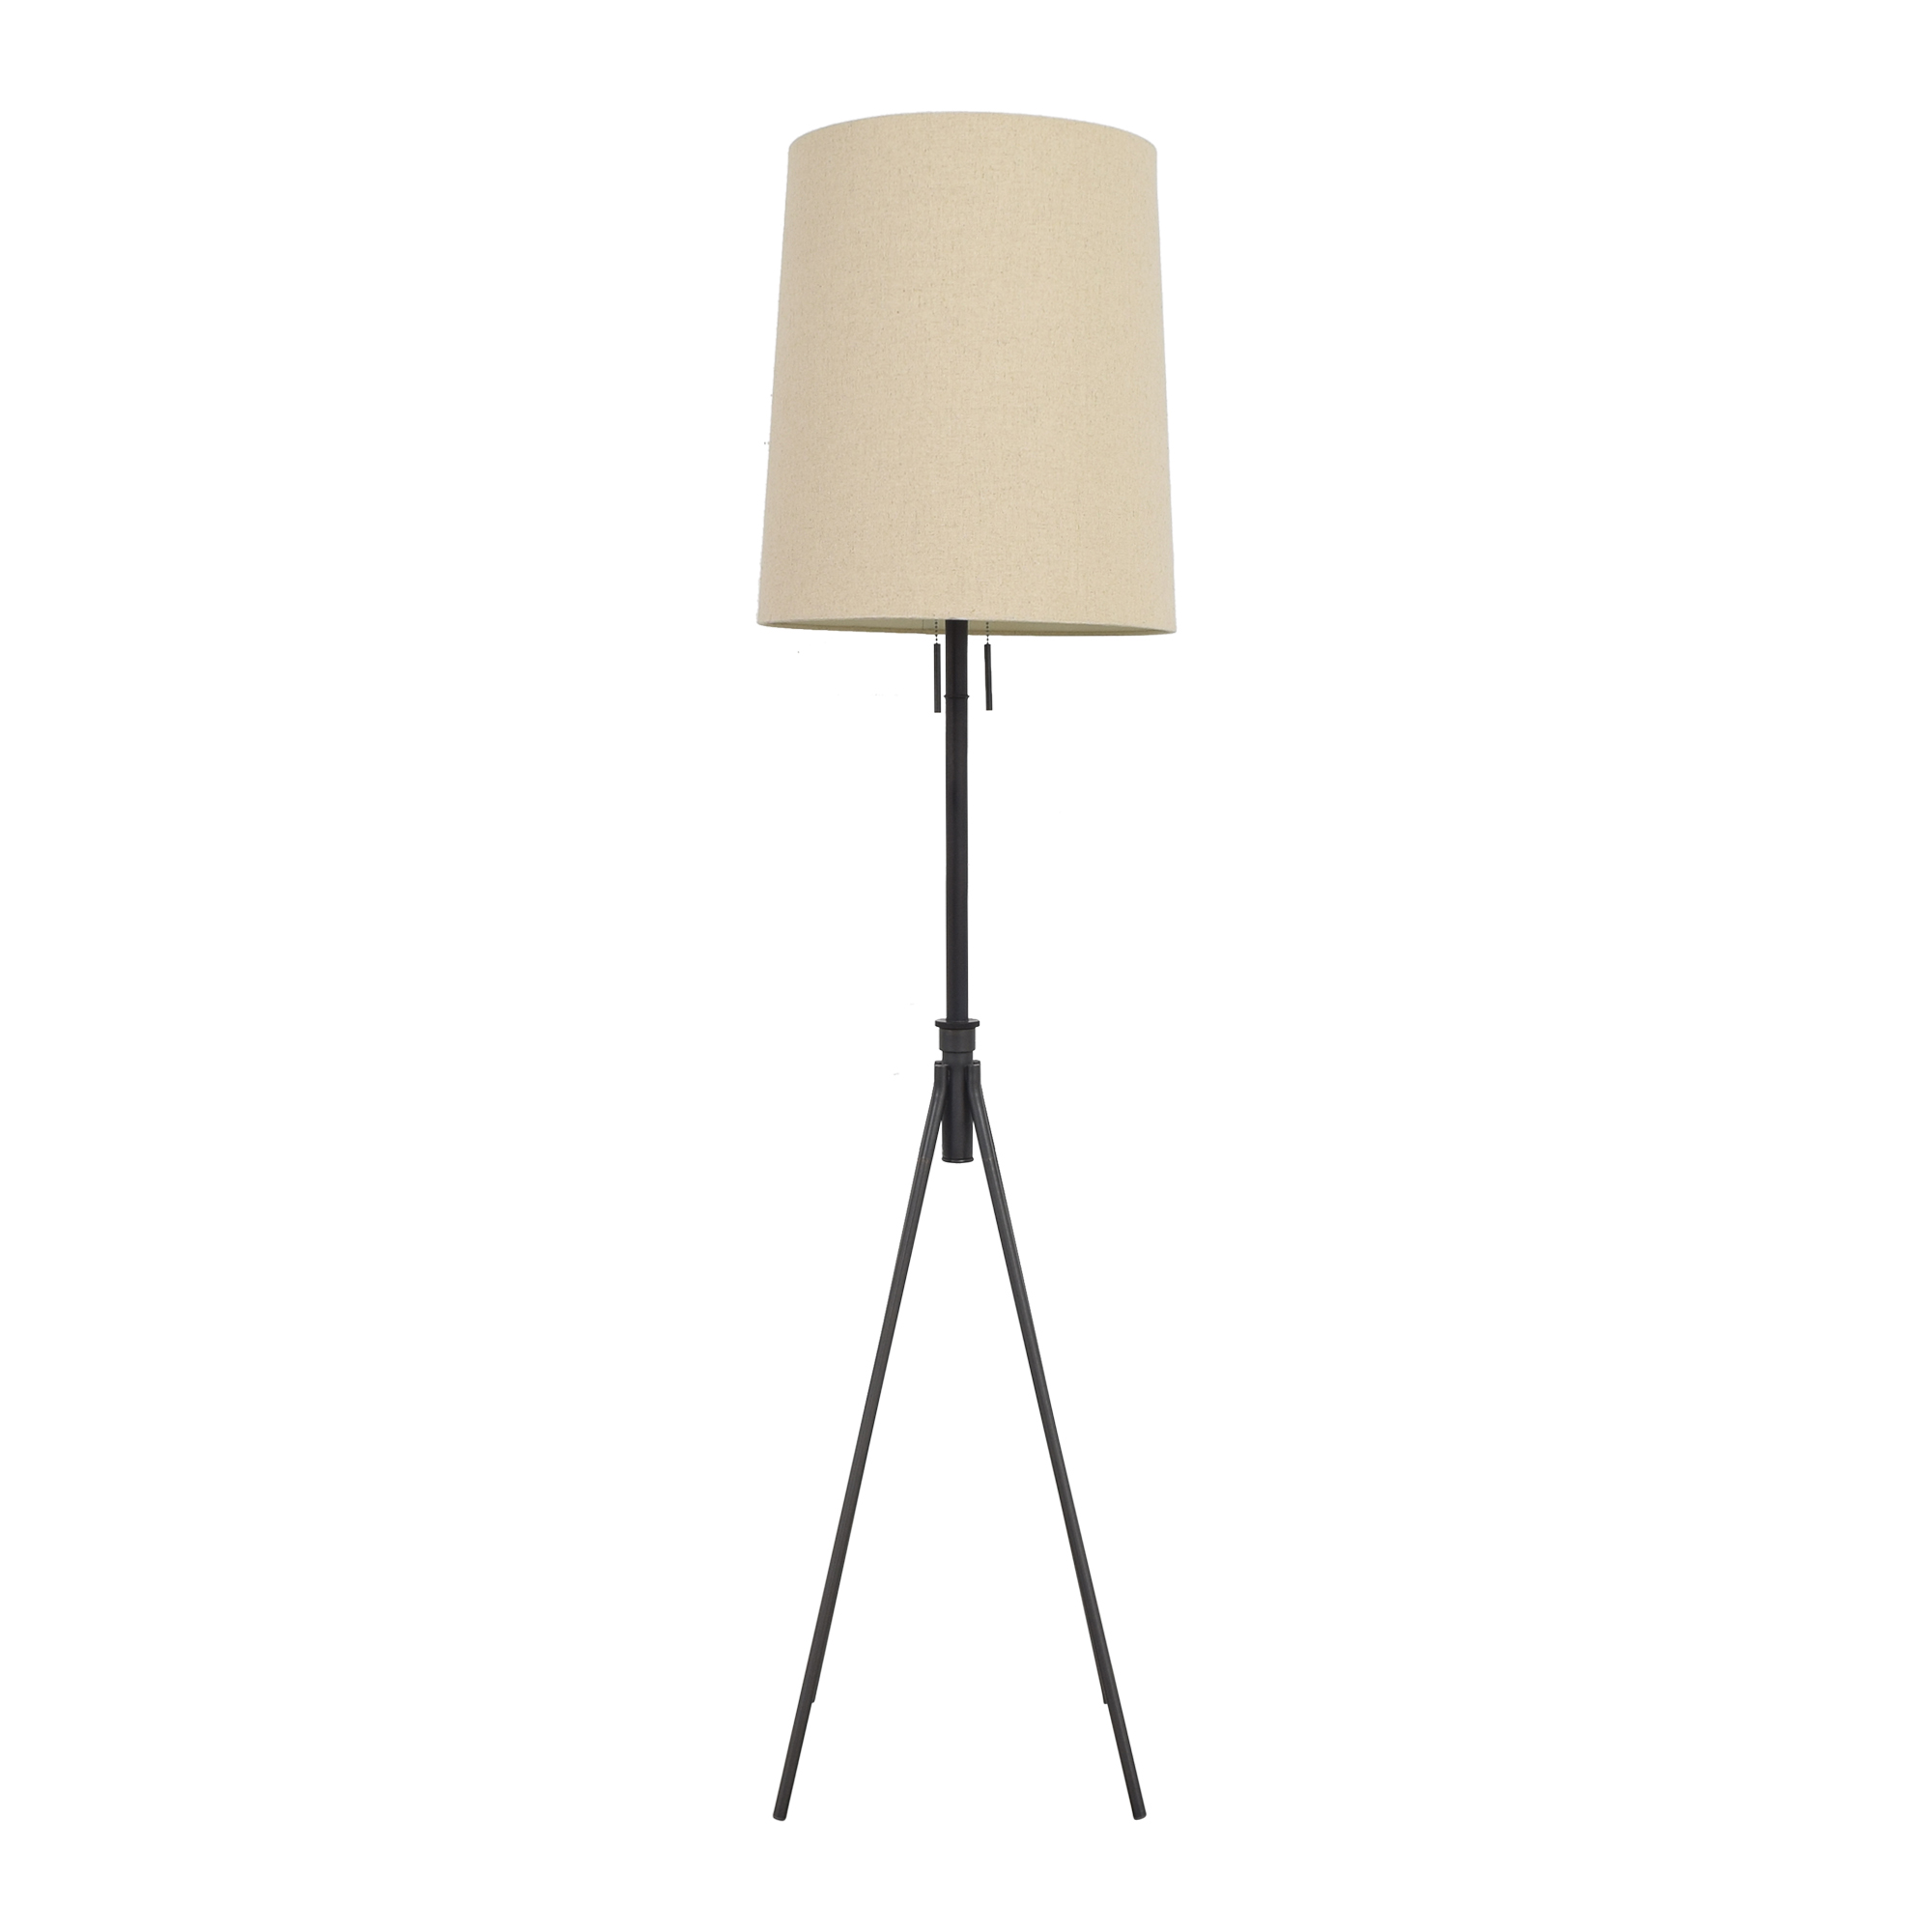 shop West Elm Adjustable Floor Lamp West Elm Decor